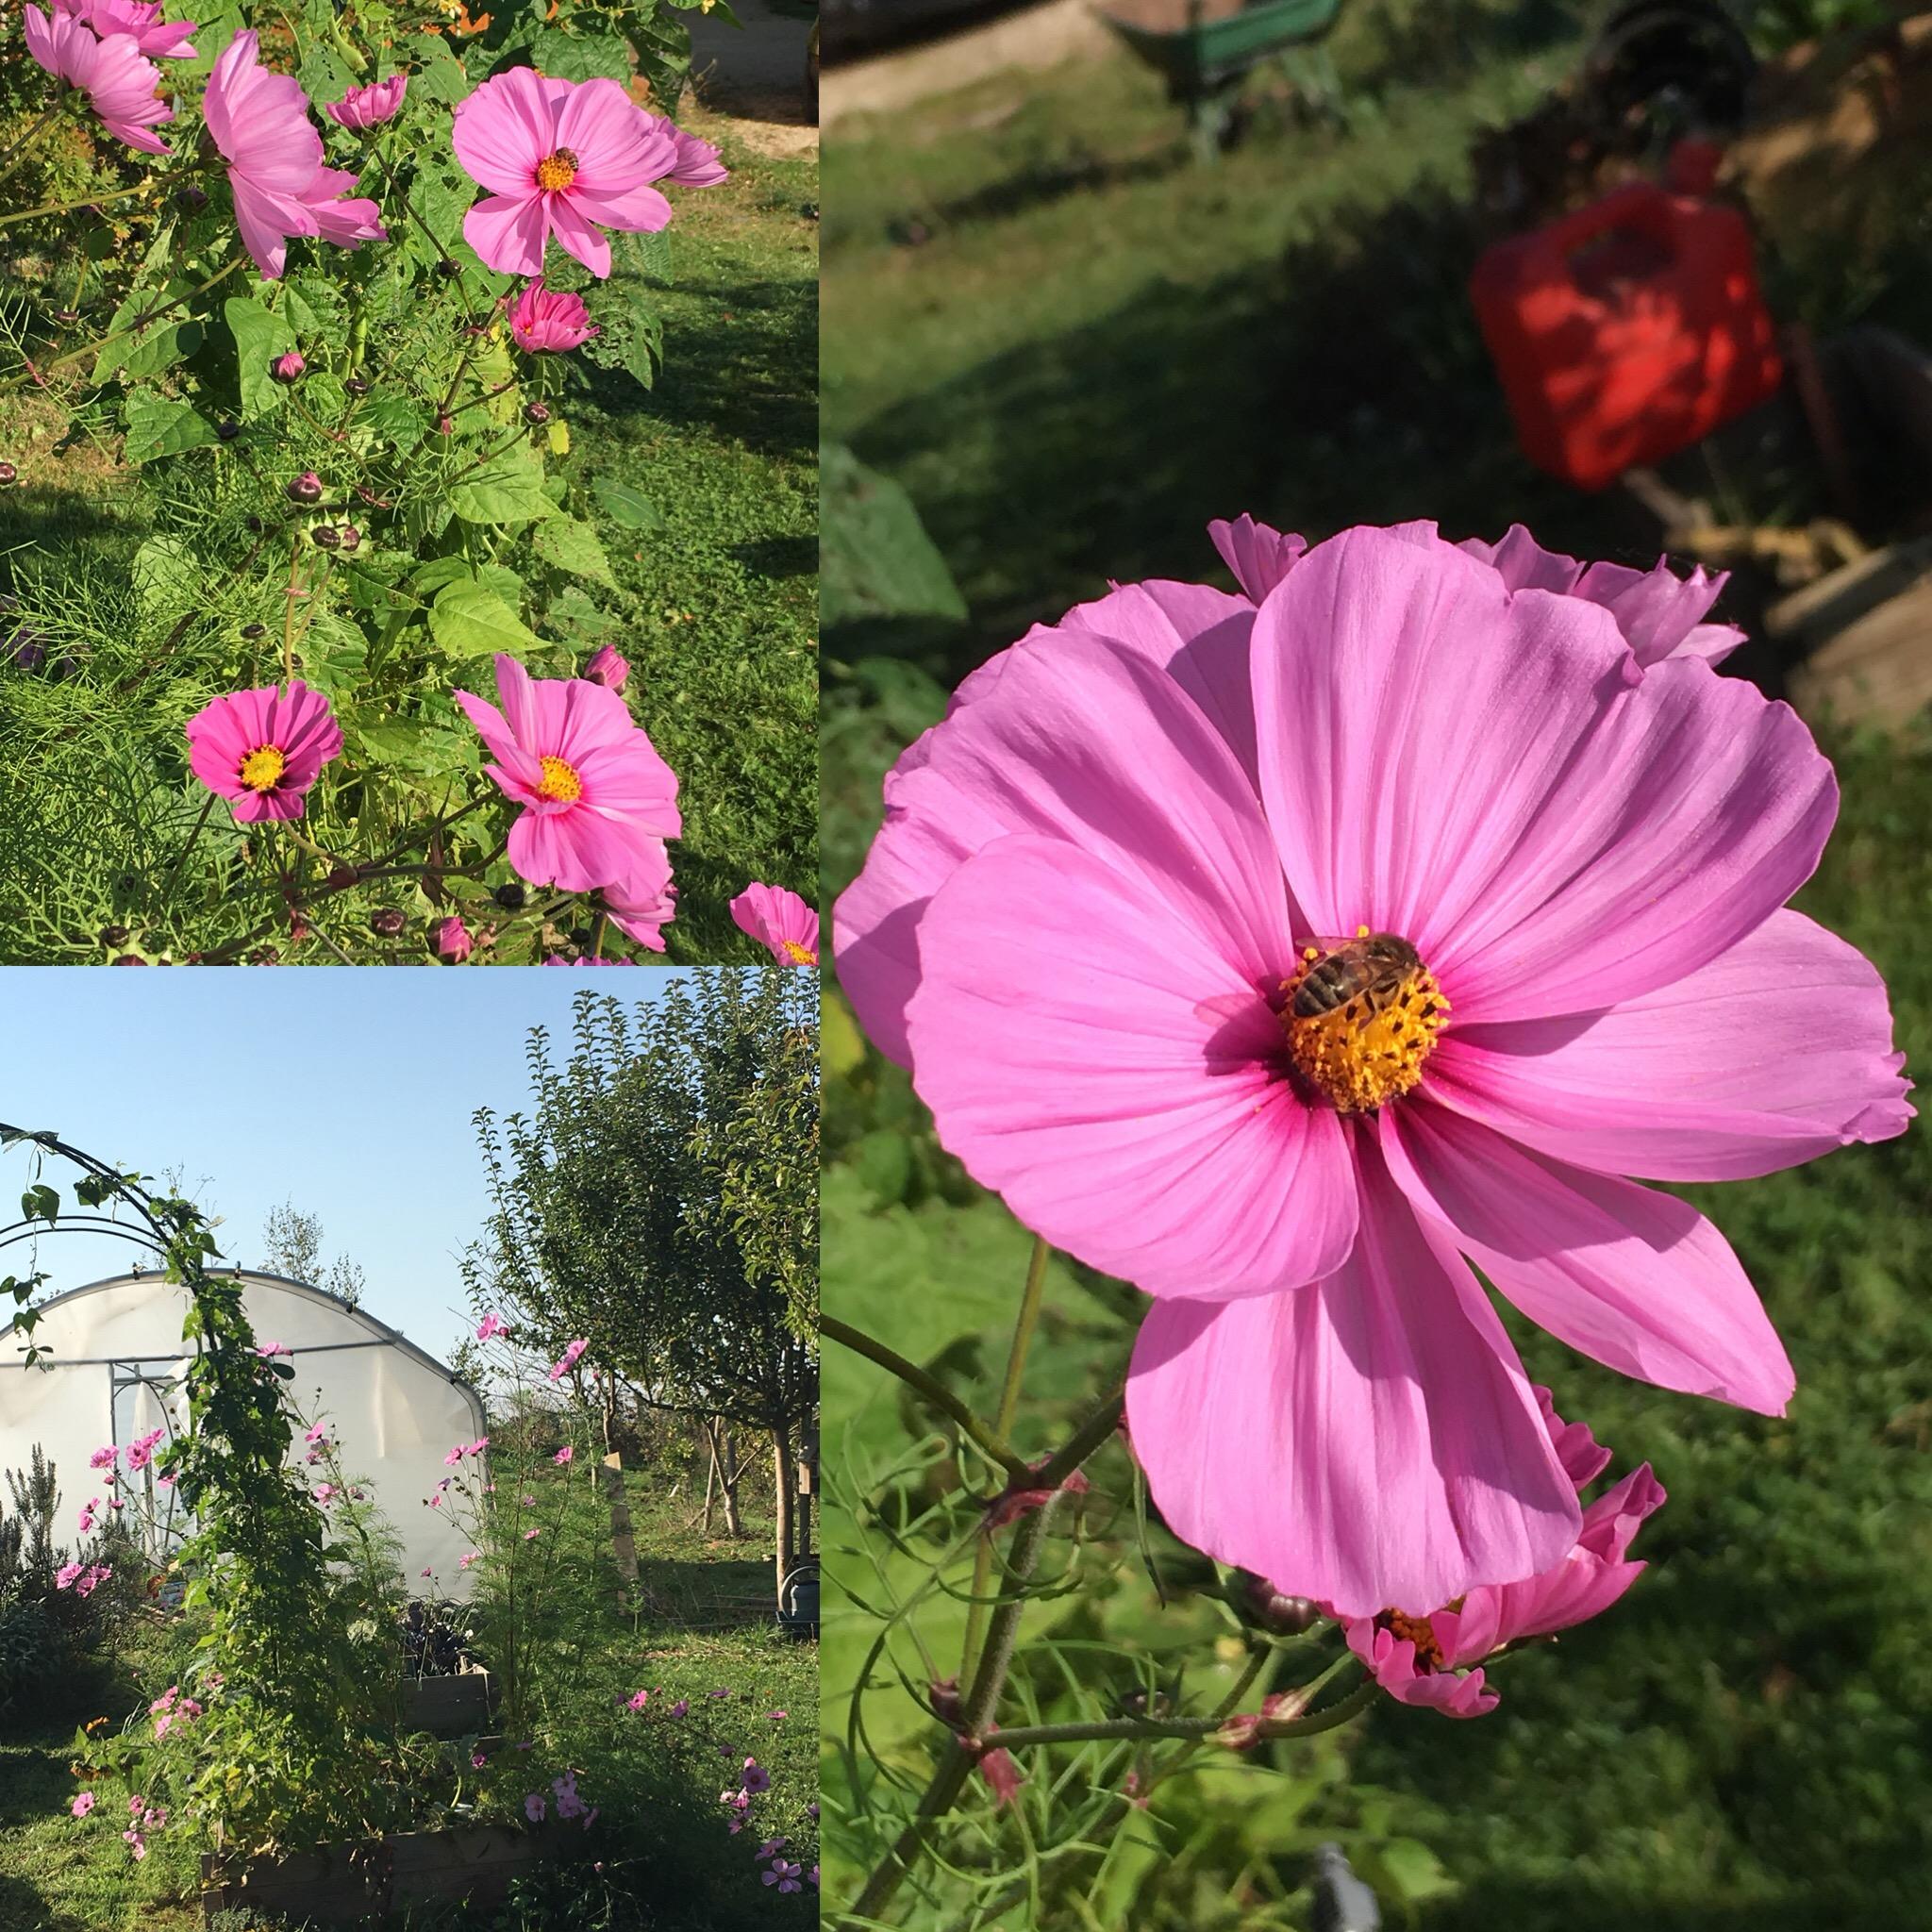 Jardin en septembre/octobre